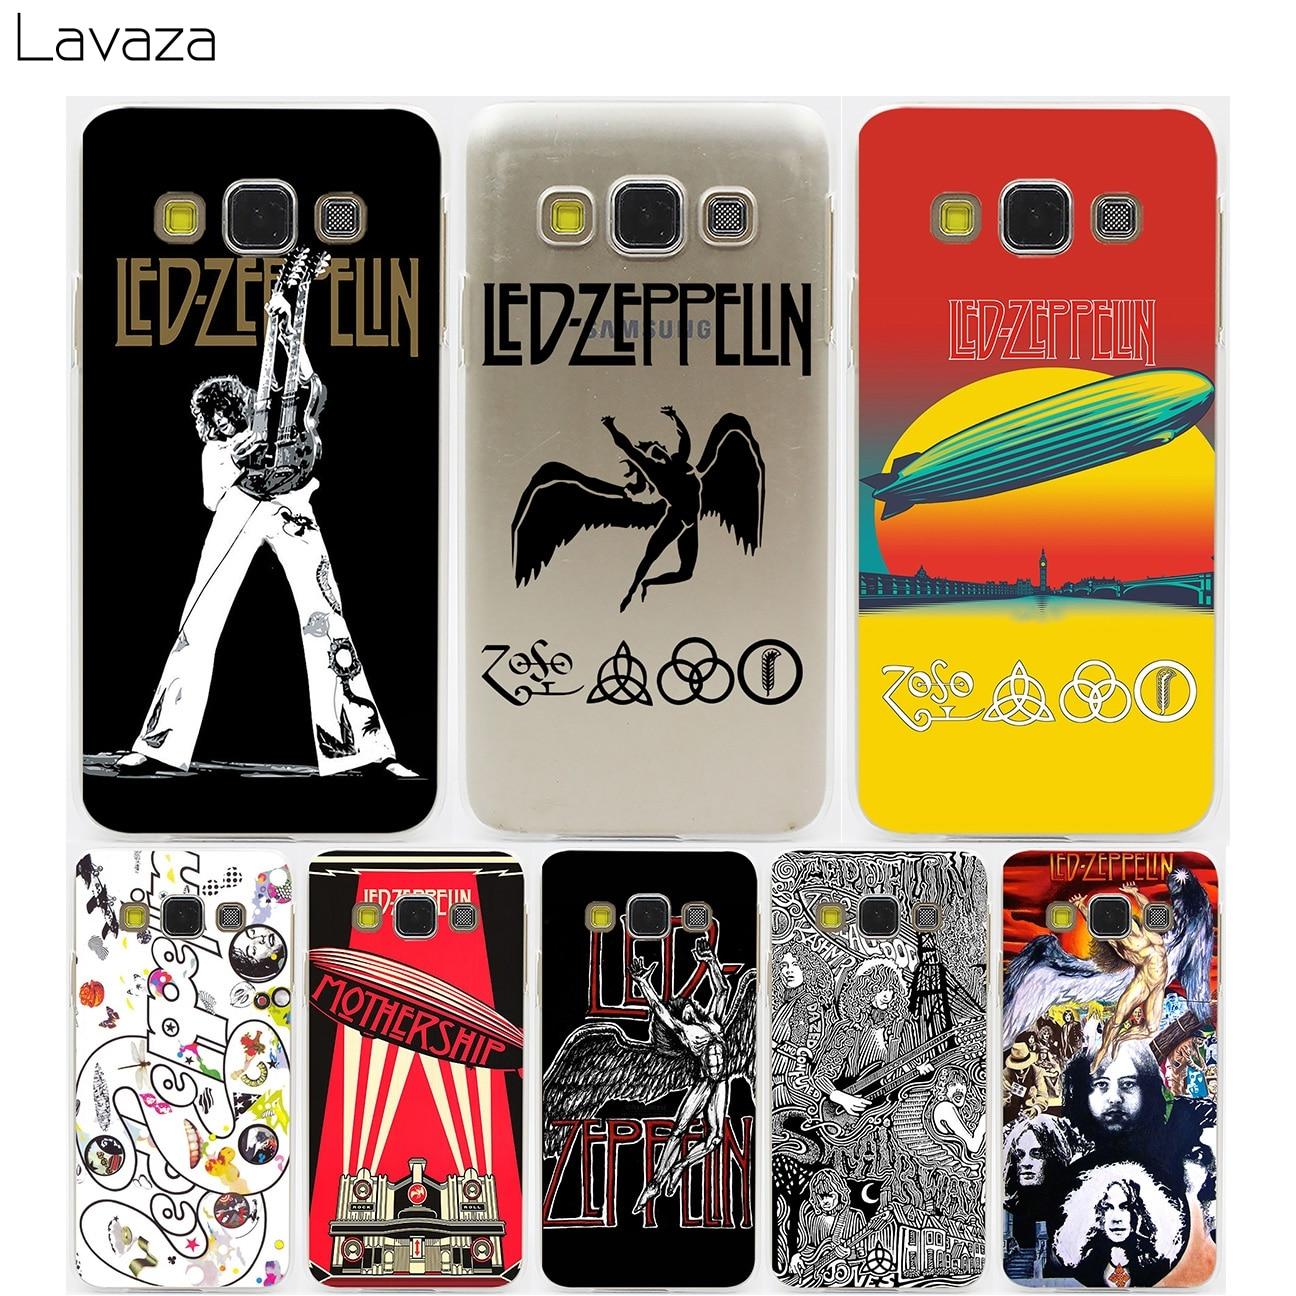 Lavaza <font><b>Led</b></font> Zeppelin Hard Transparent Case for Samsung Galaxy S3 S4 S5 &#038; Mini S6 <font><b>S7</b></font> S8 <font><b>Edge</b></font> Plus